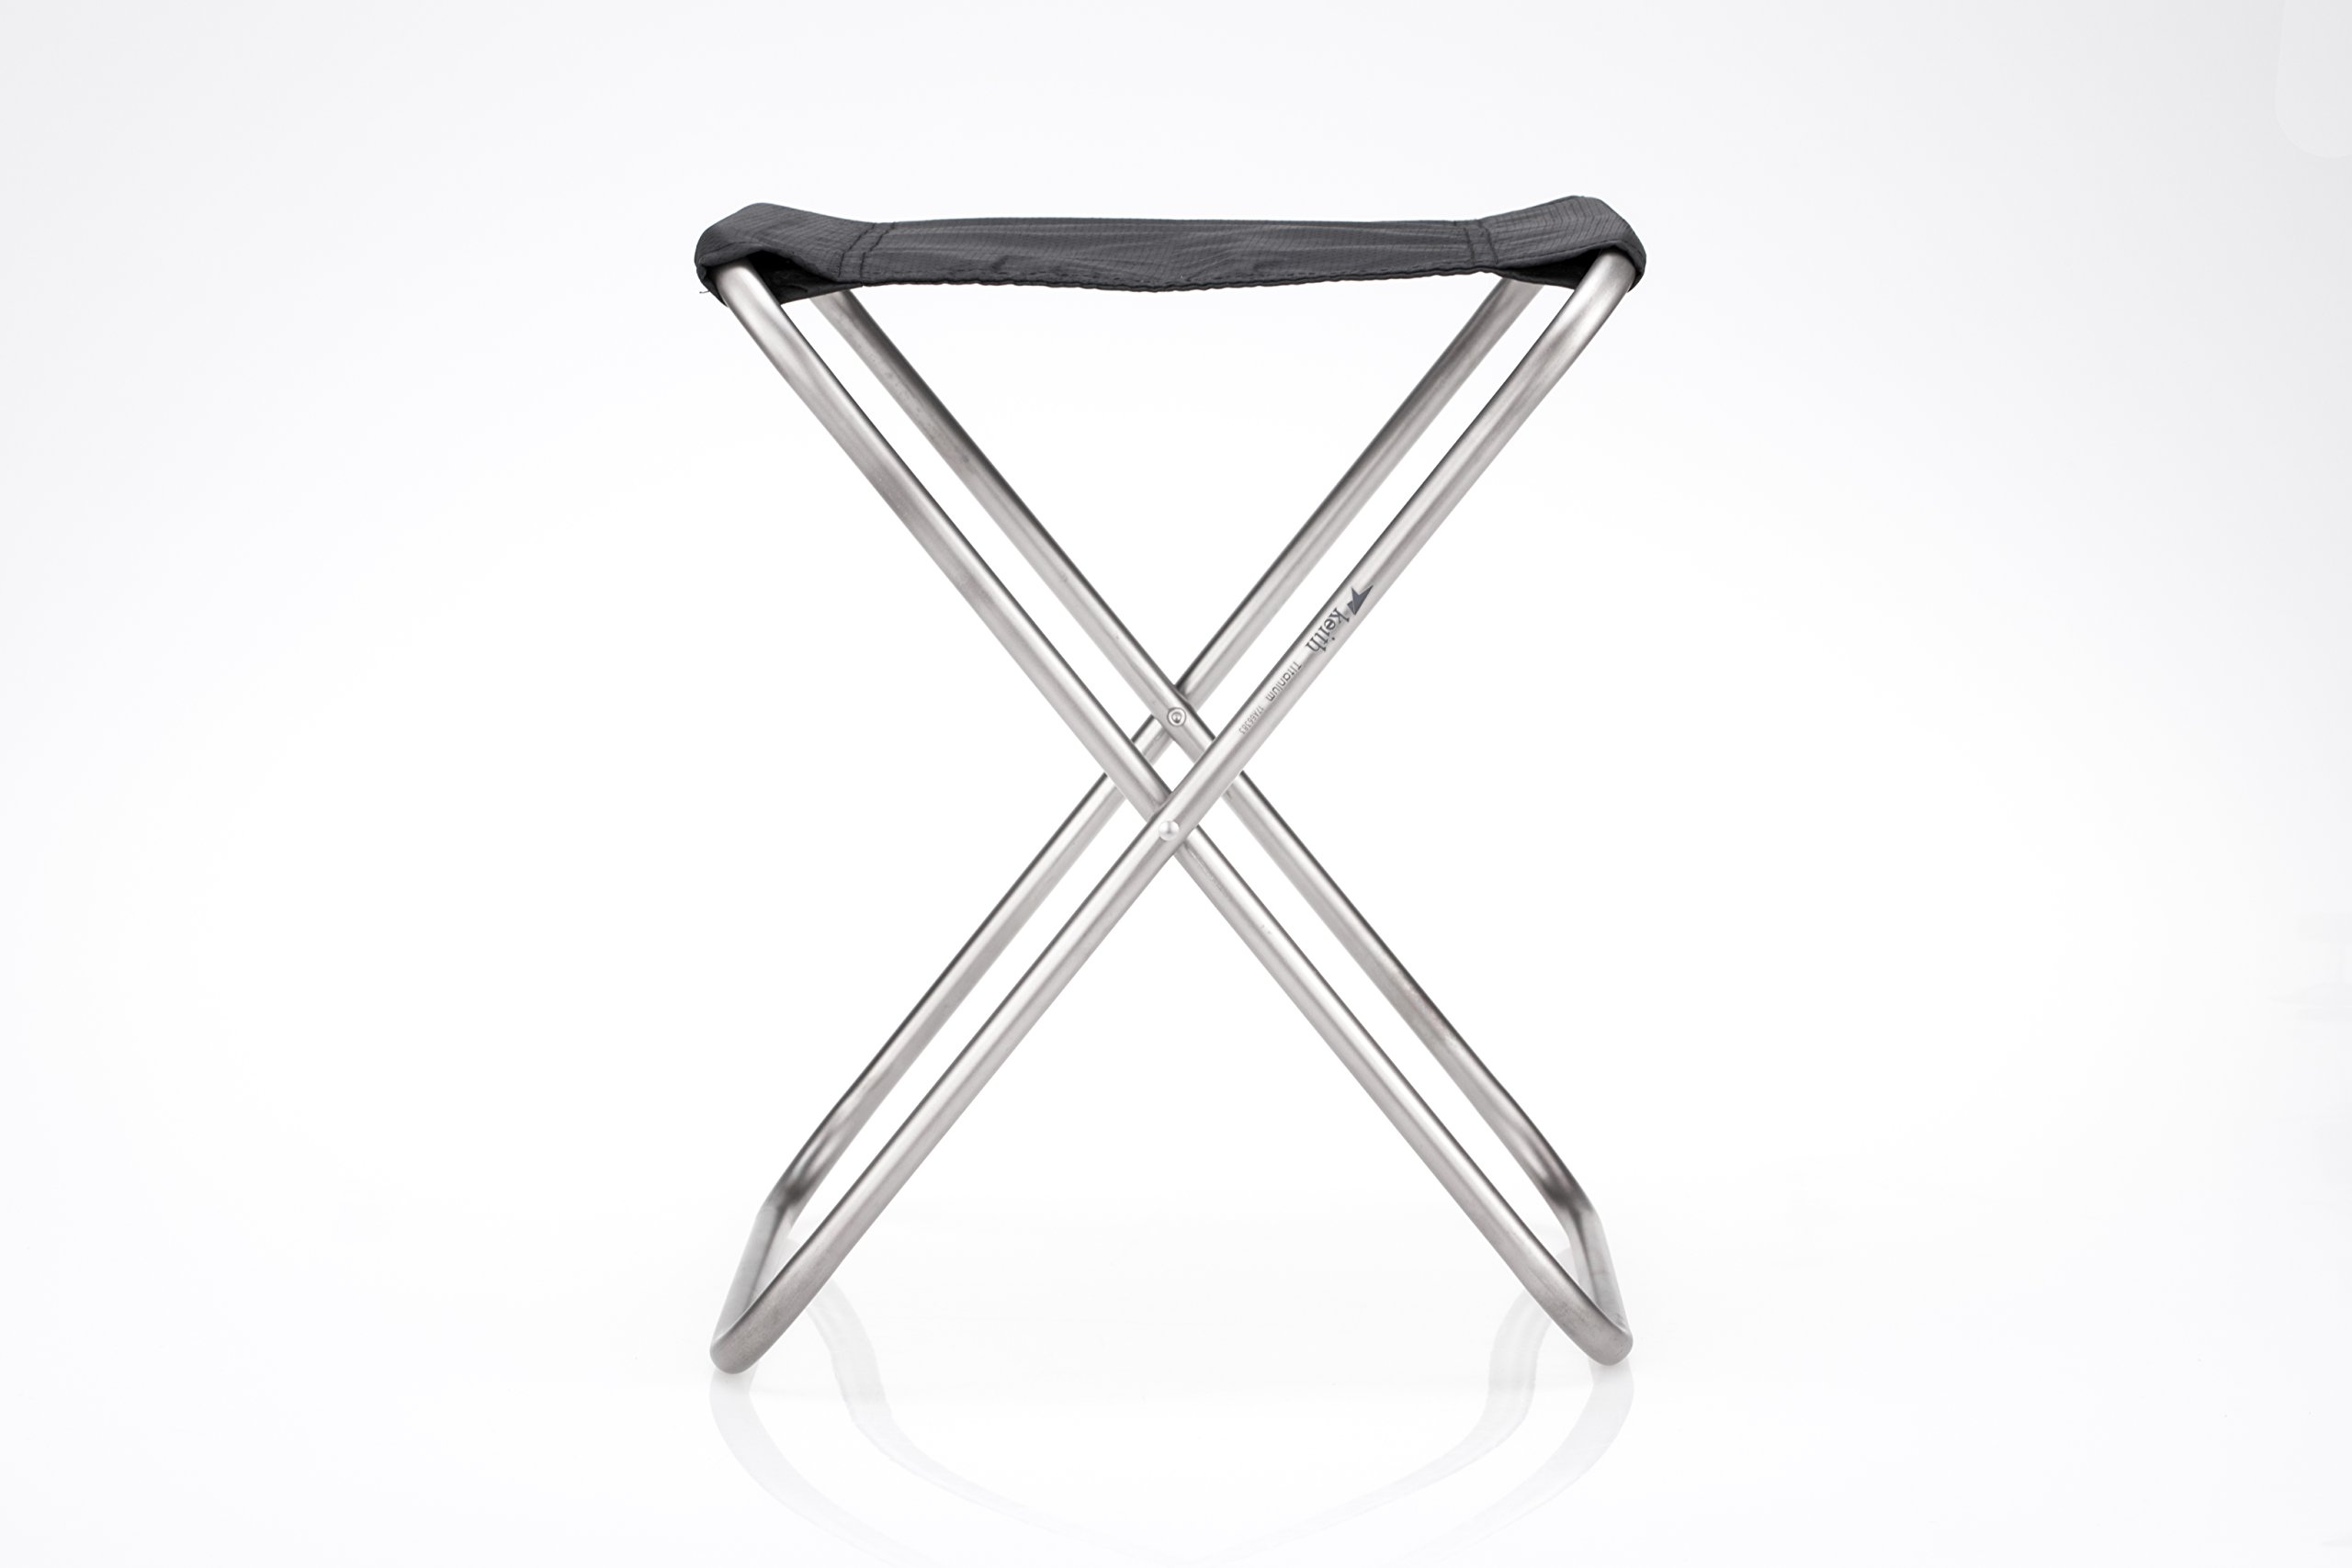 Keith Titanium Ti2501 Folding Stool by Keith Titanium